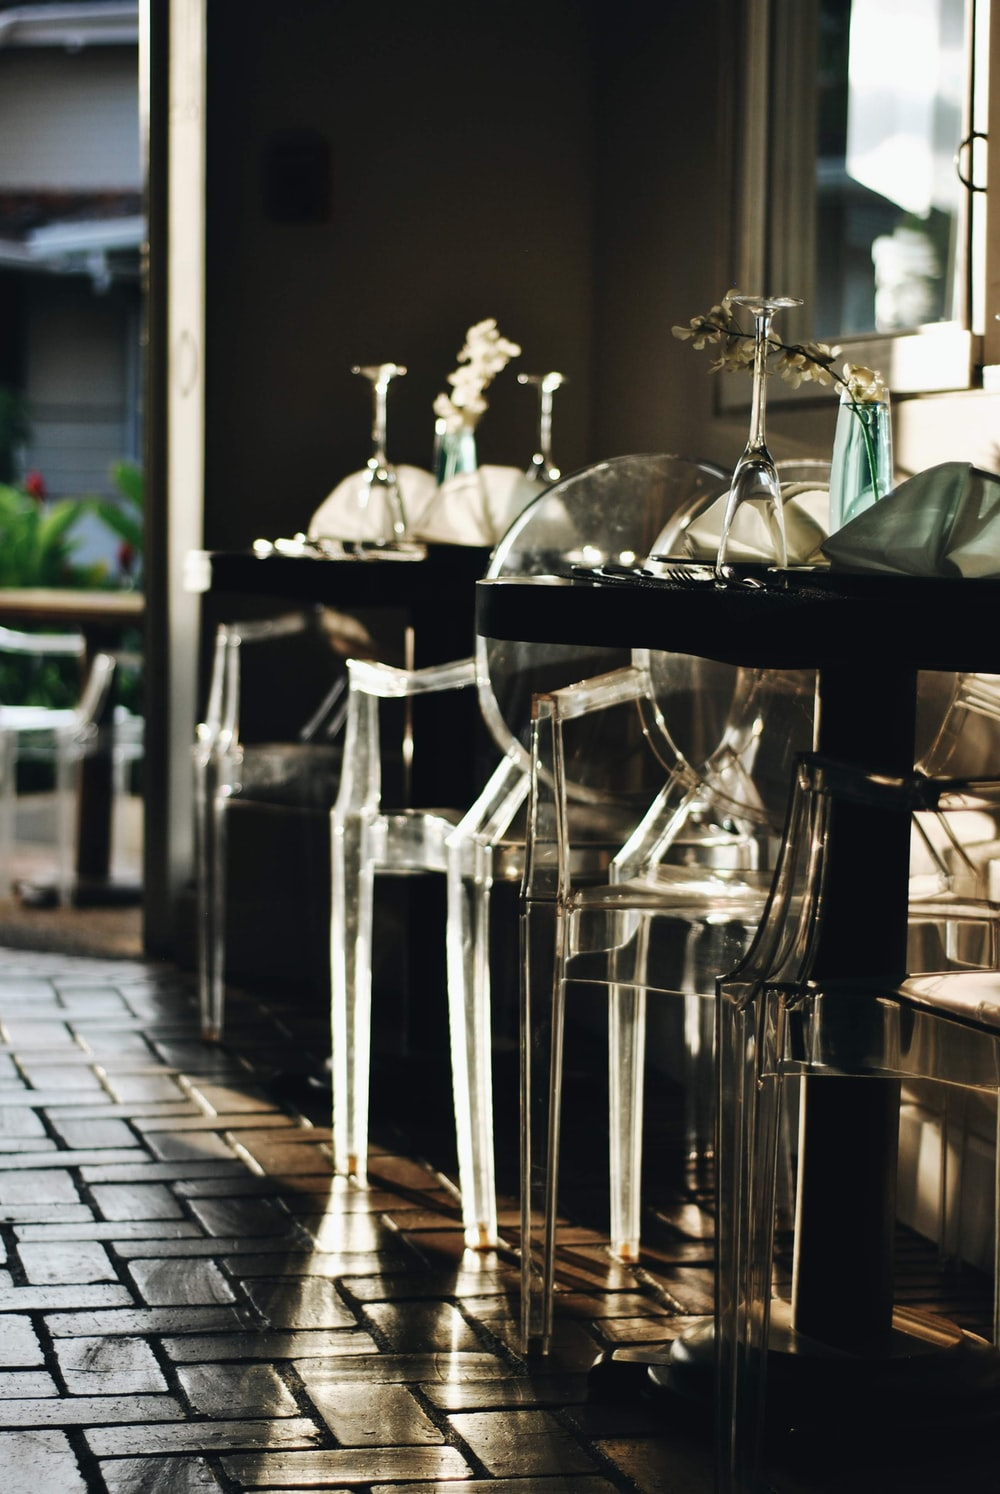 stainless steel bar stools near glass window